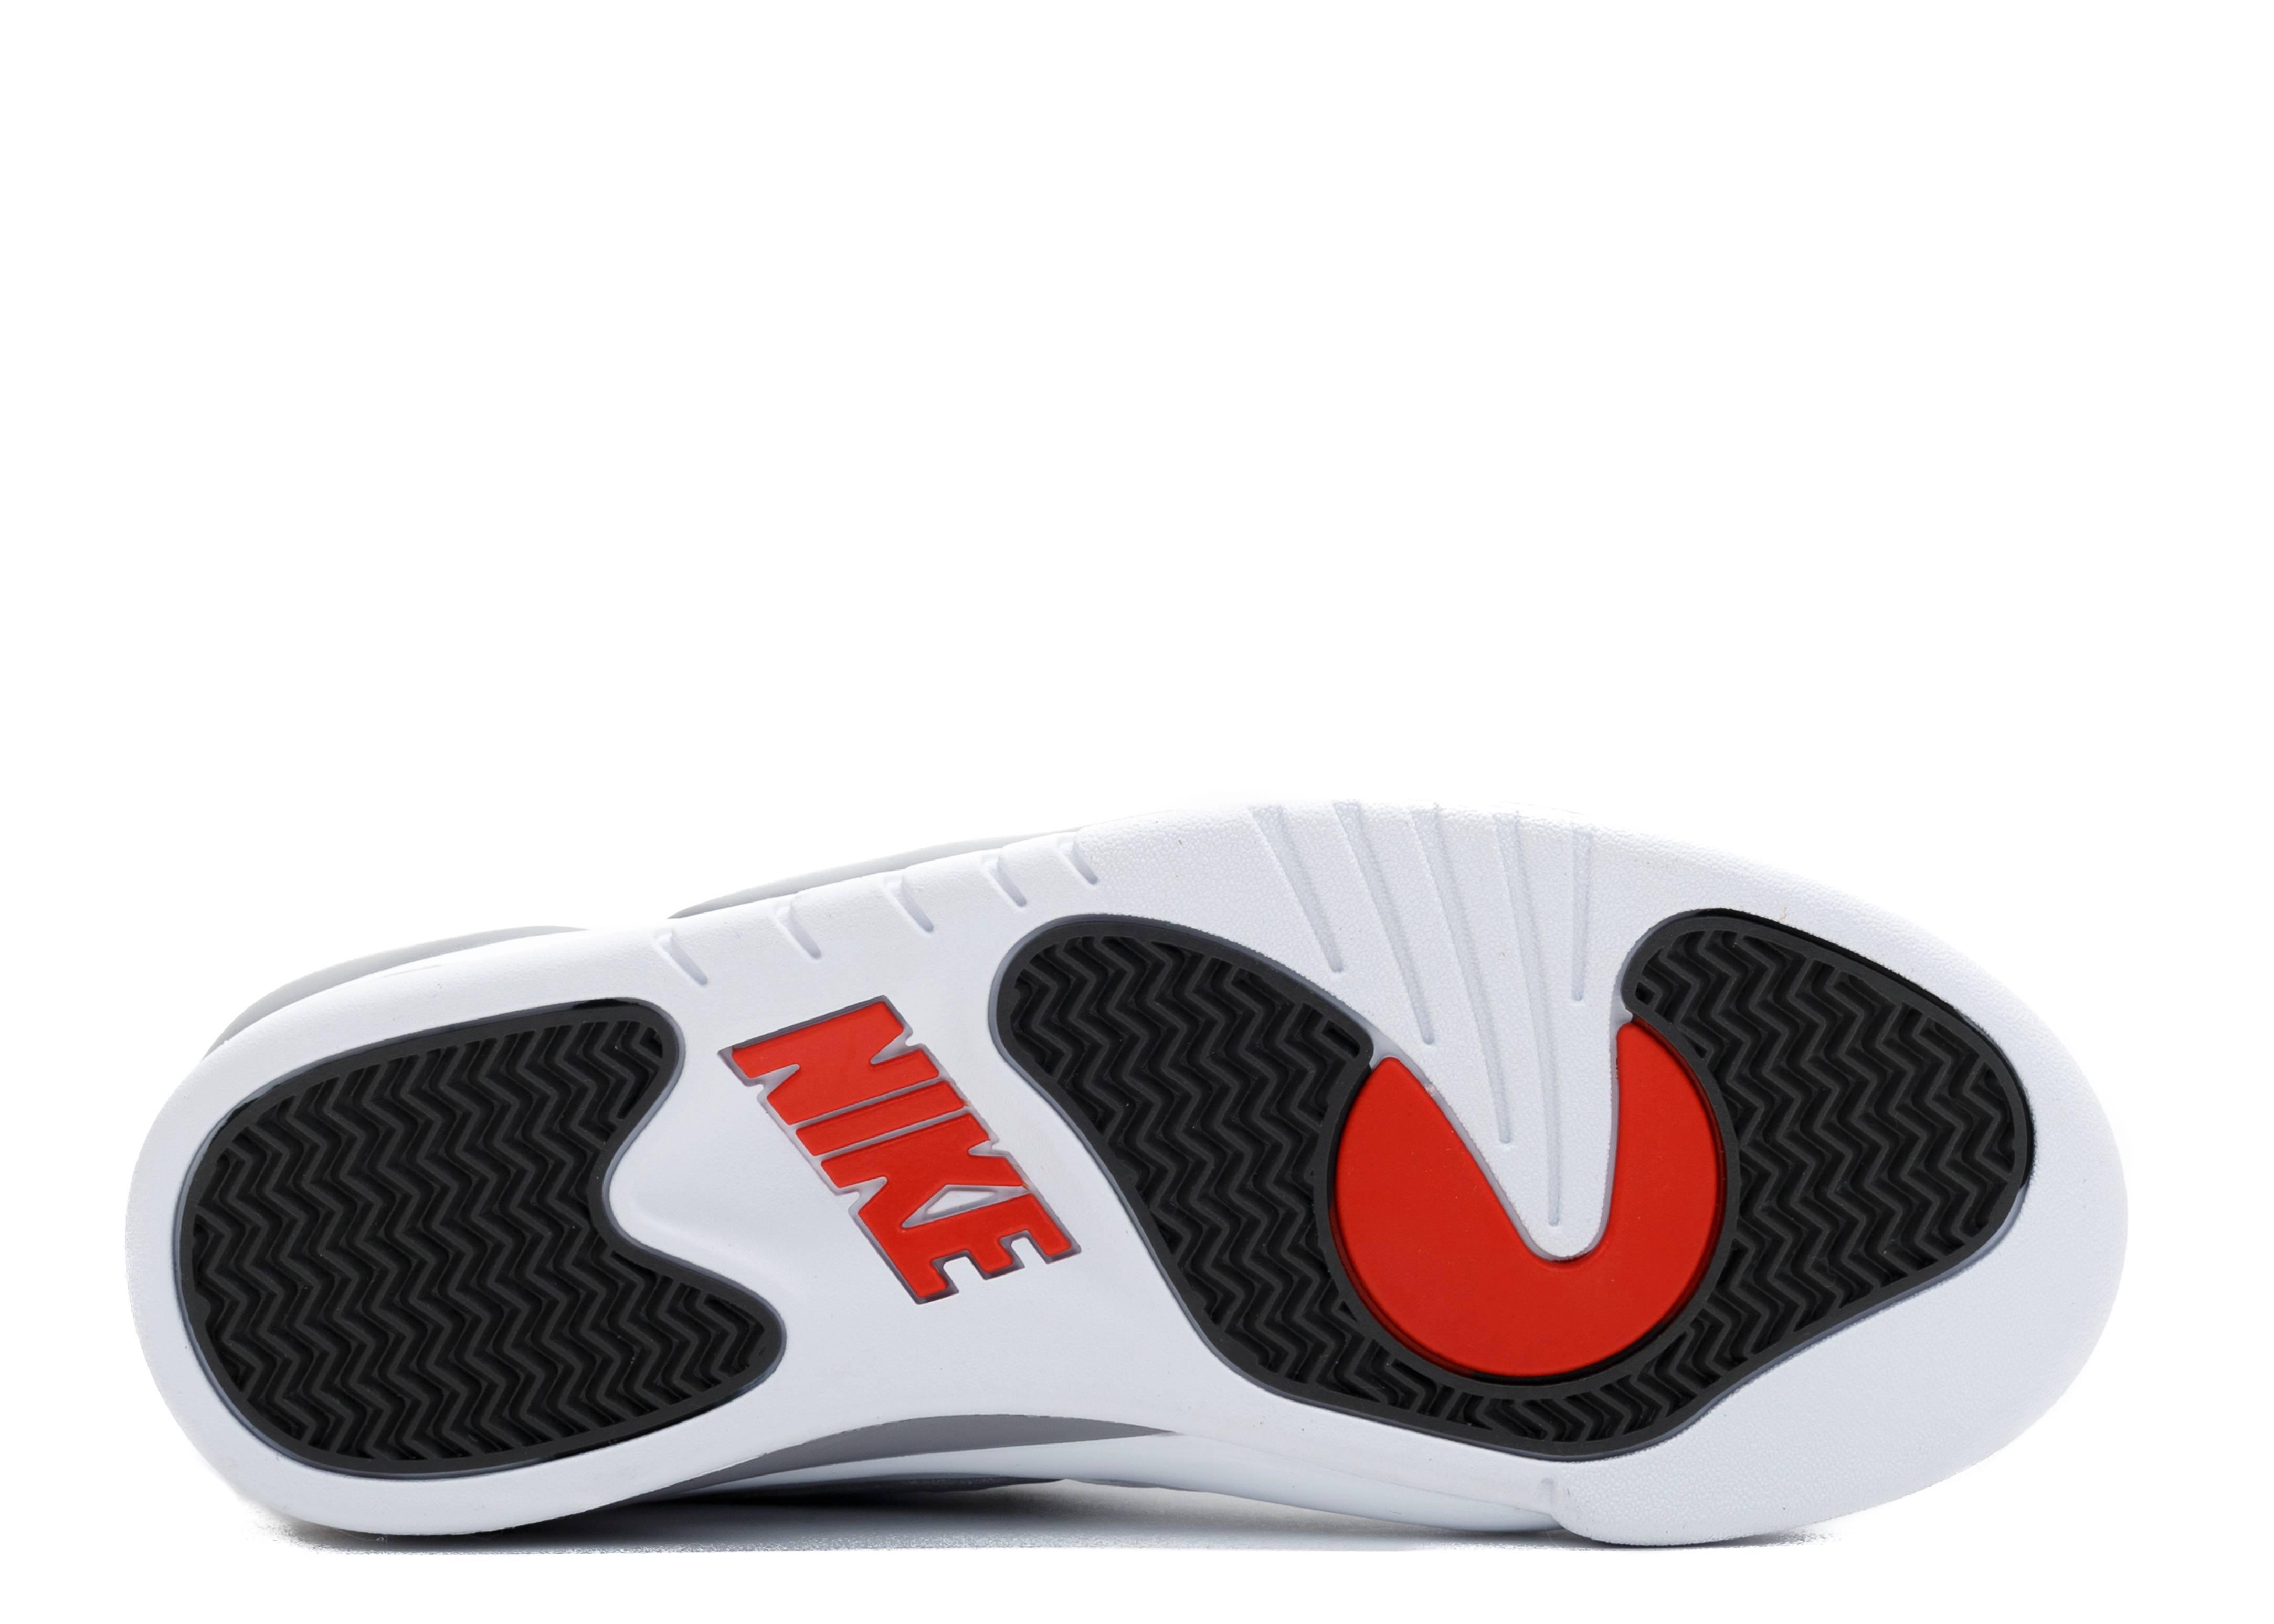 Air Pressure Nike 831279 100 White Cement Grey Varsity Red Versity R16 Flight Club